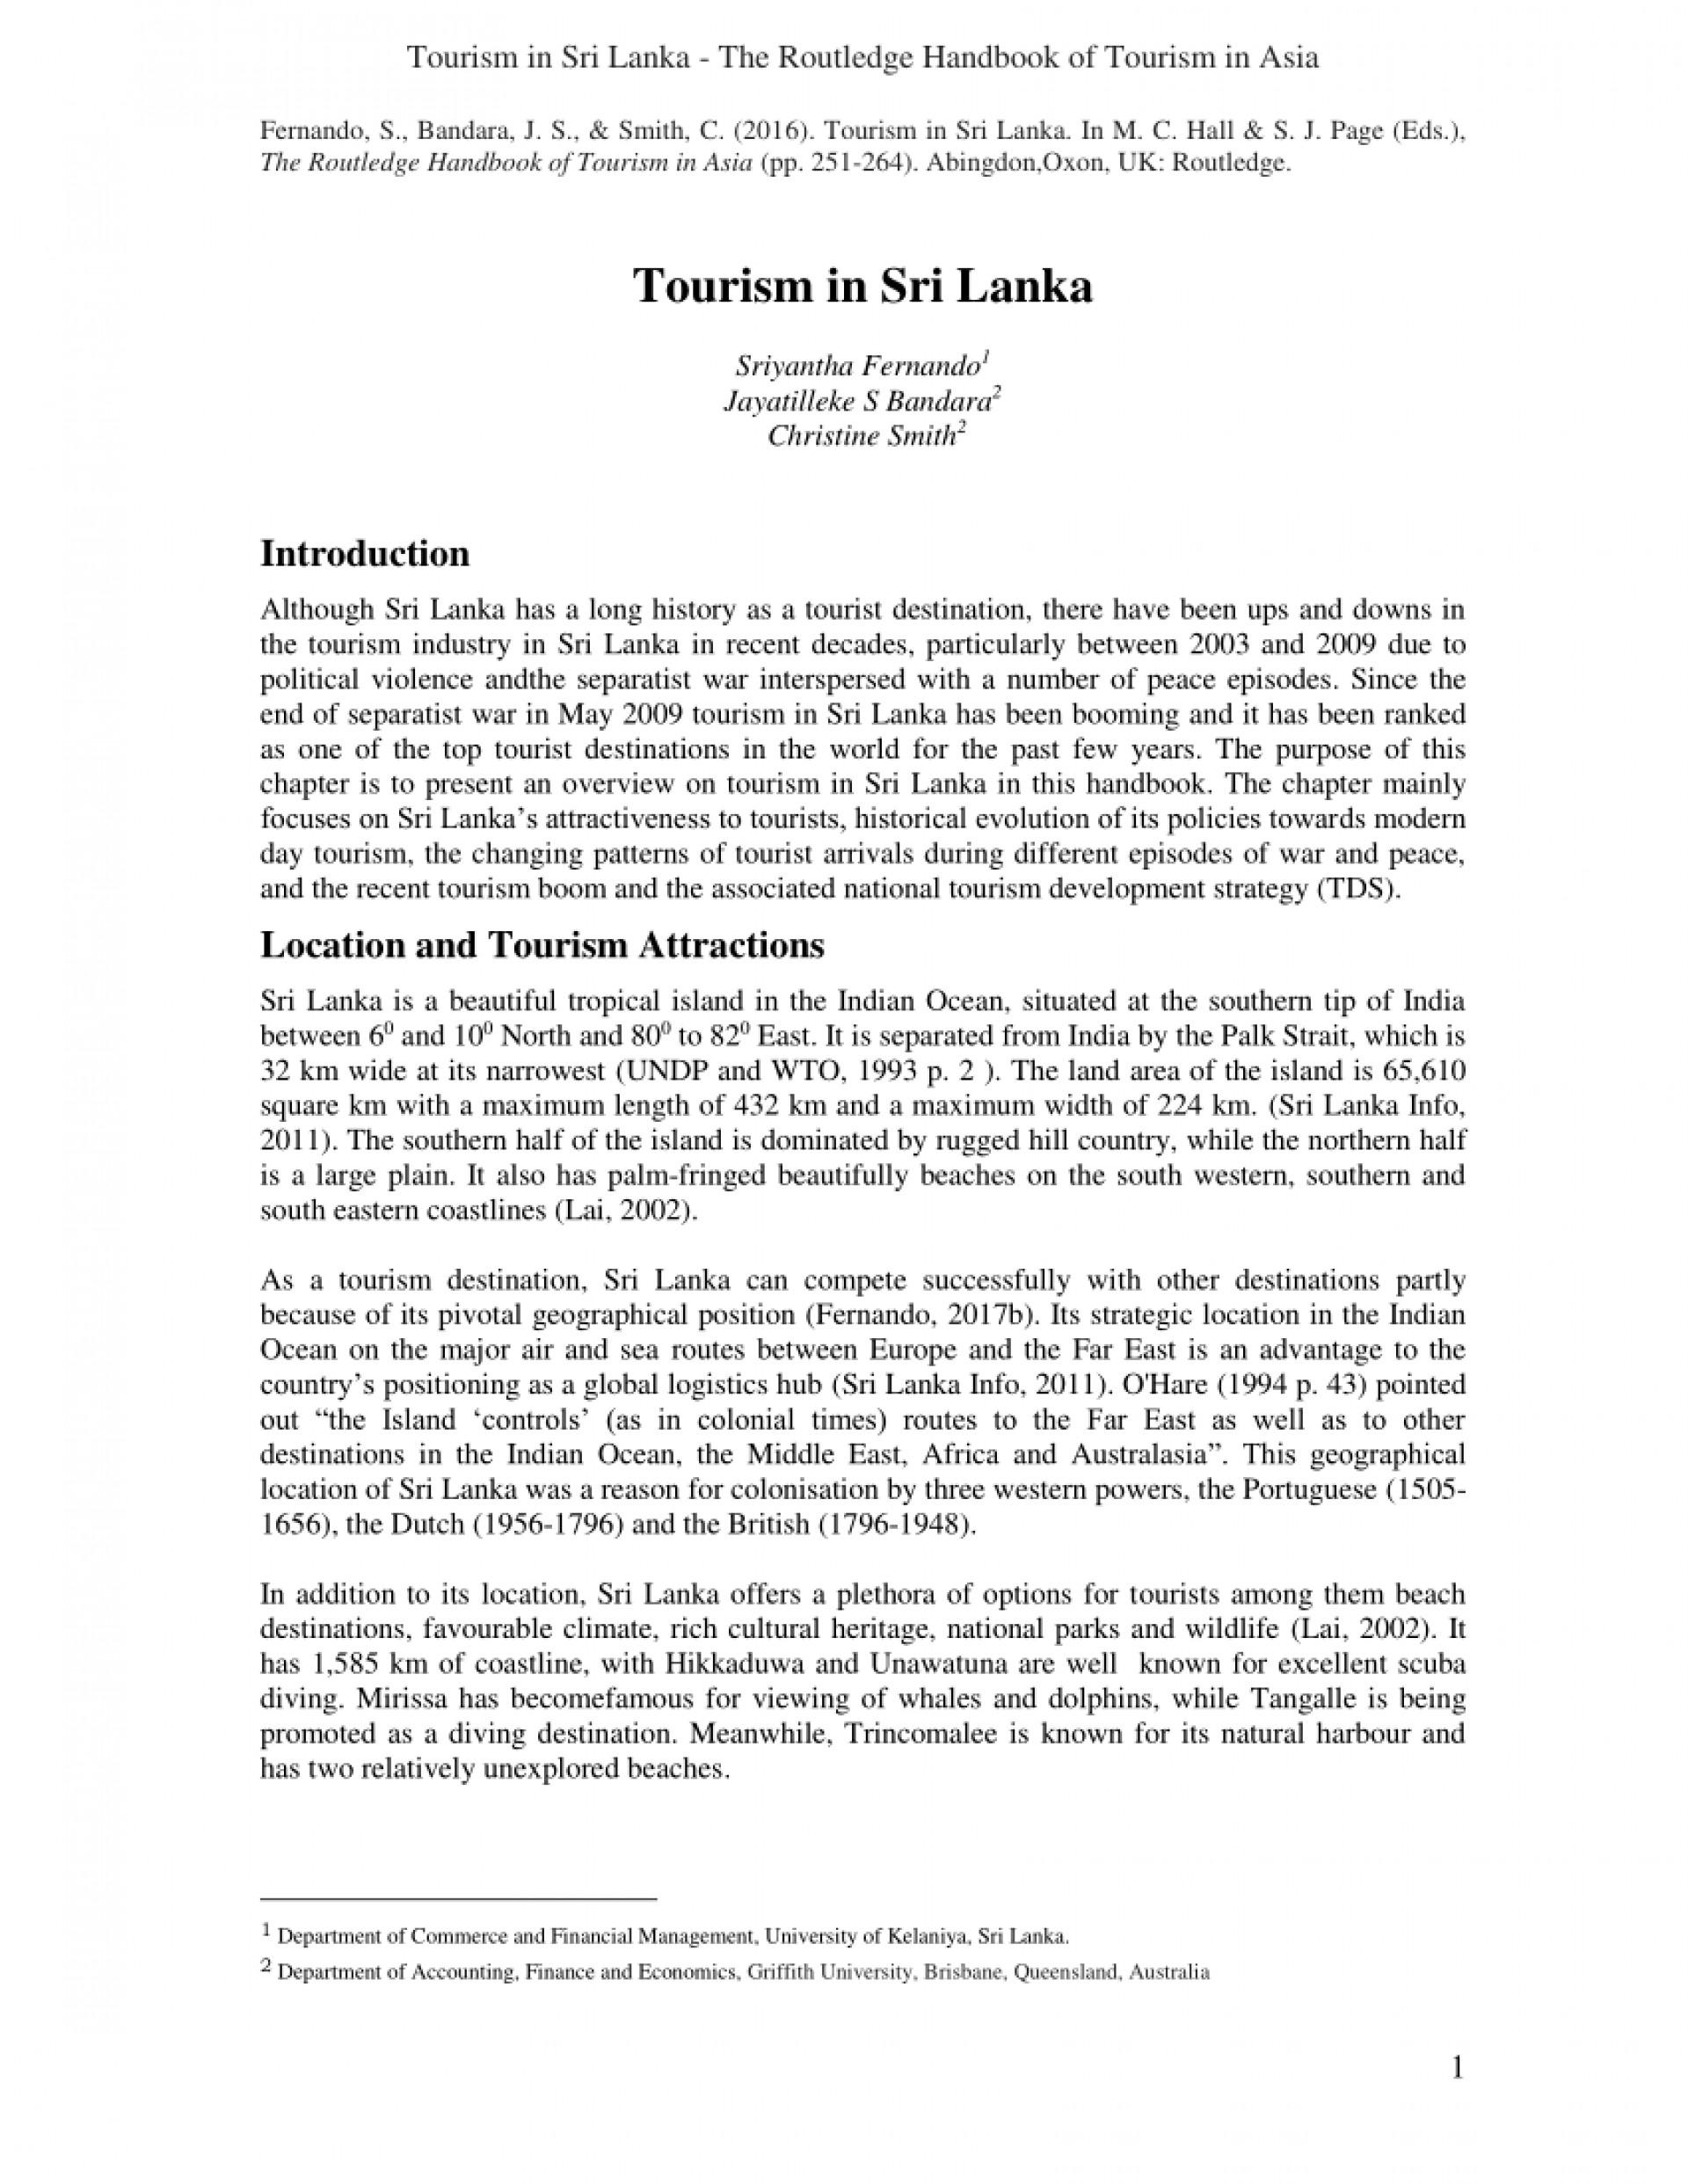 002 Natural Resources In Sri Lanka Essay Largepreview Fantastic 1920